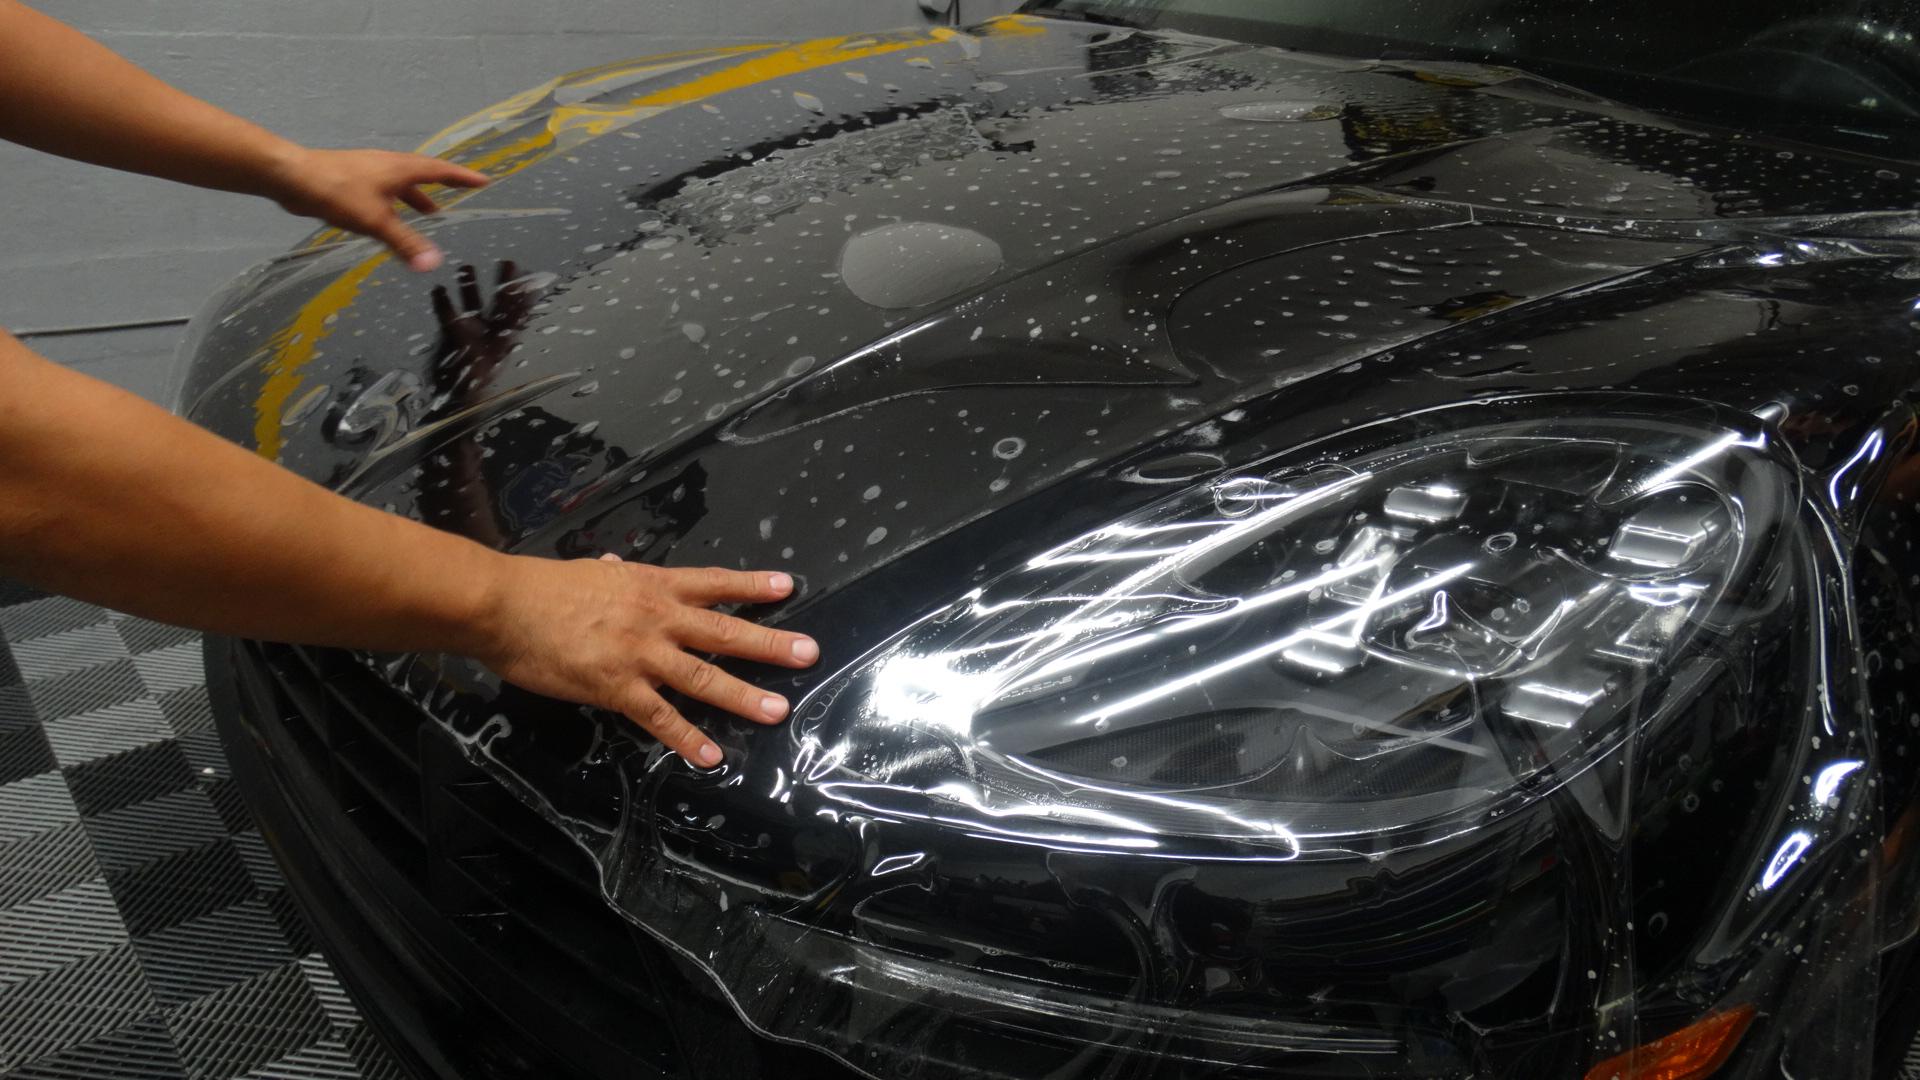 Porsche Macan clear Bra Miami